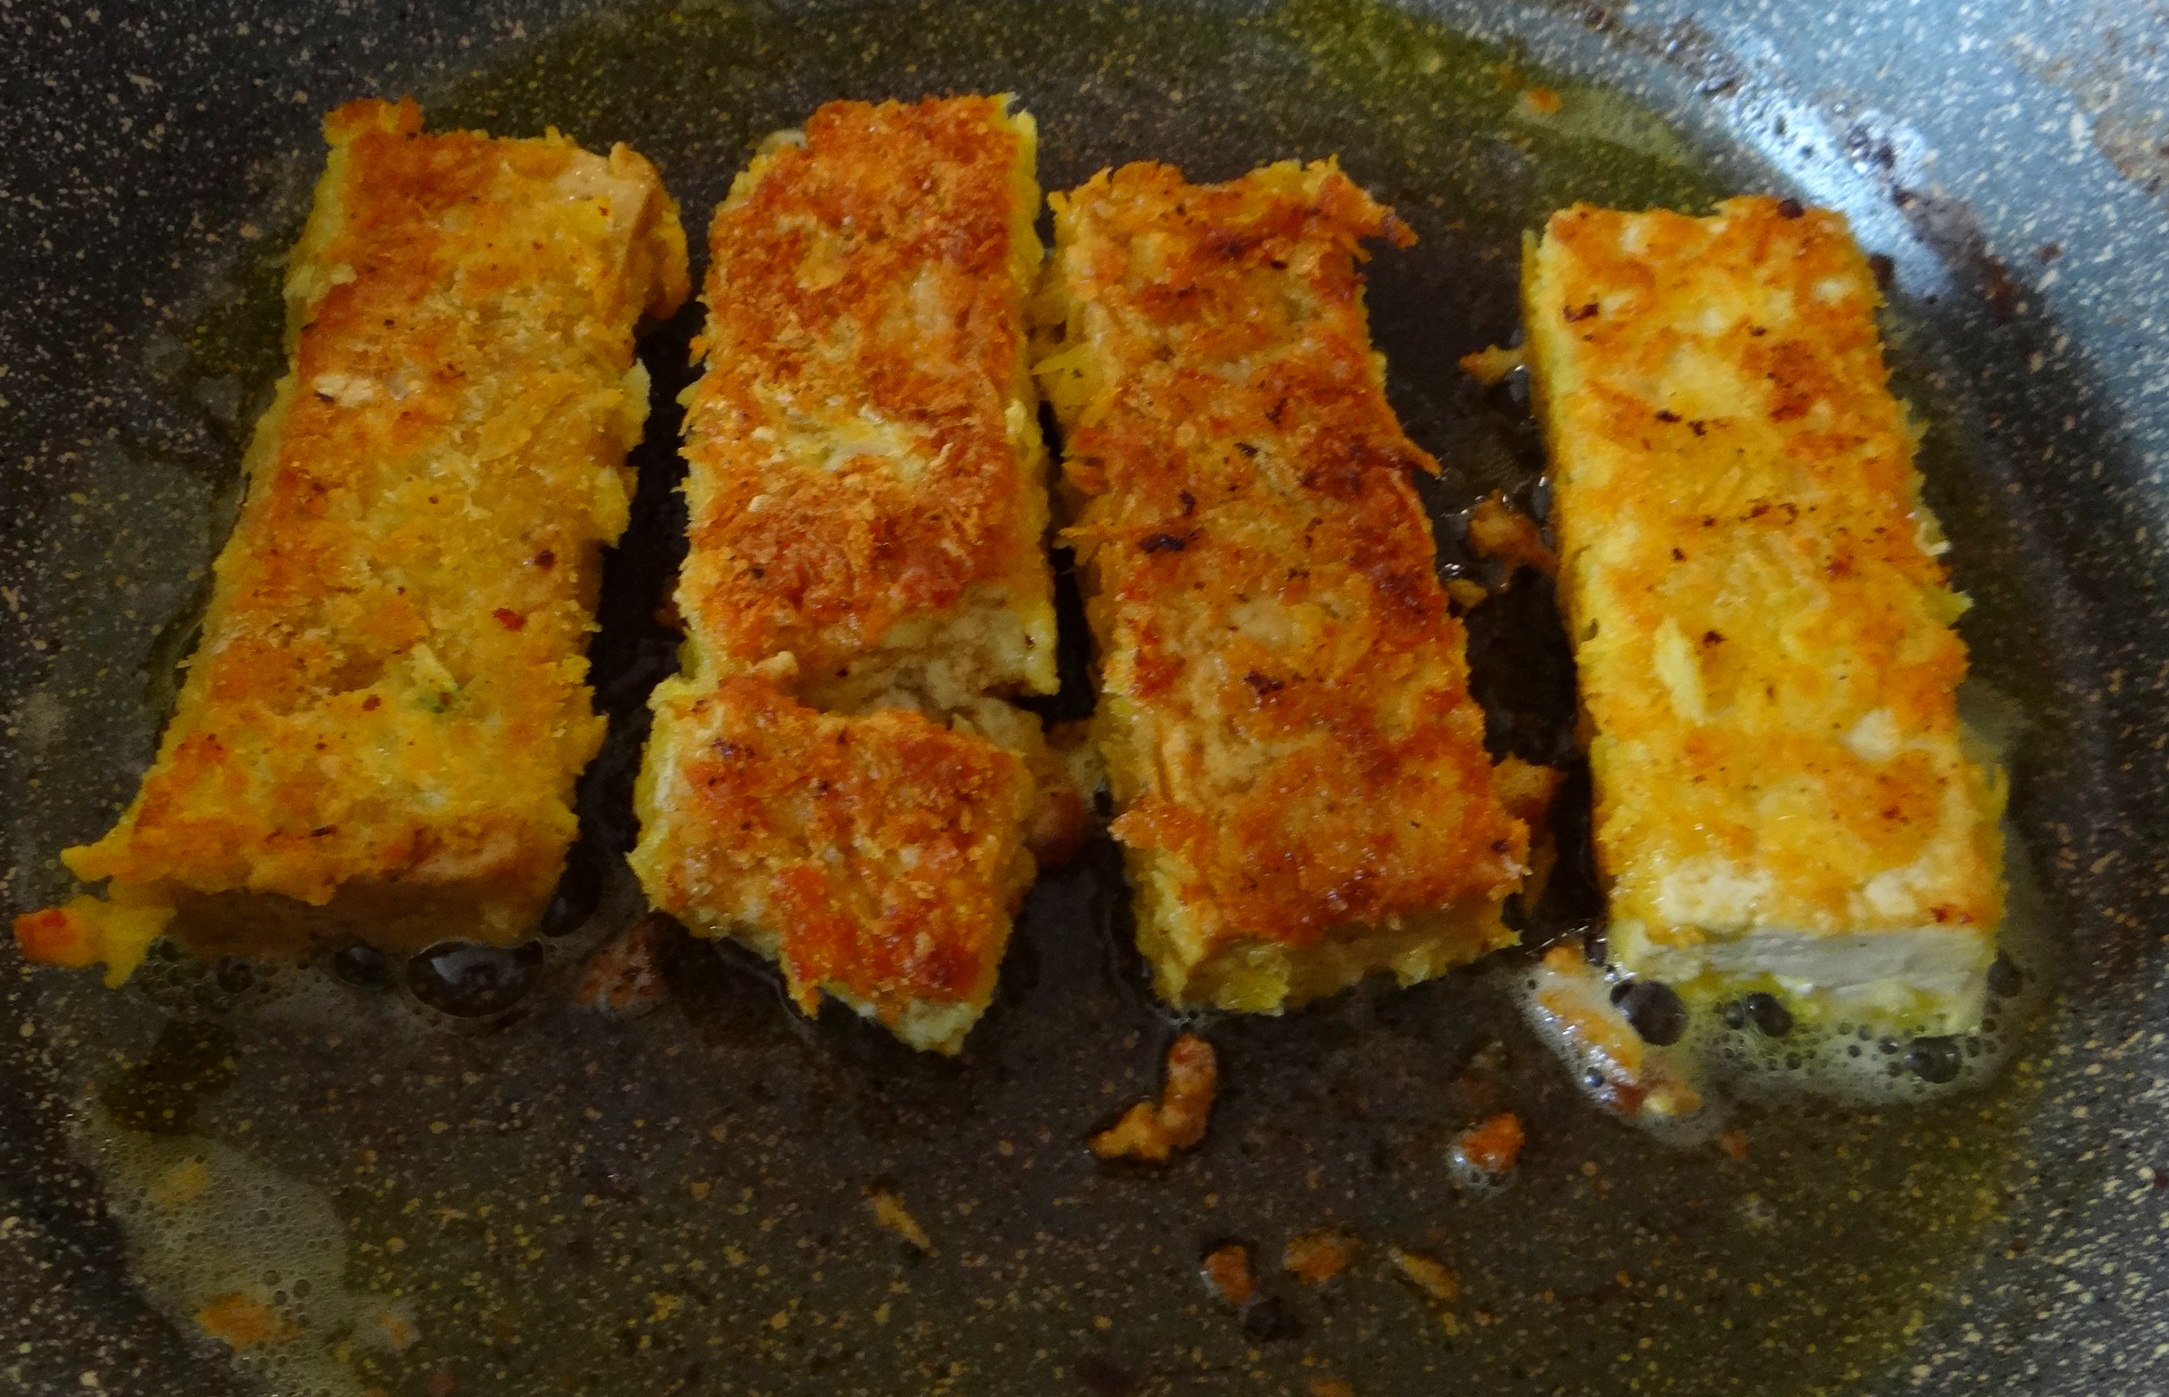 Seidentofu,Frisee Salat,Kartoffel Mix (8)